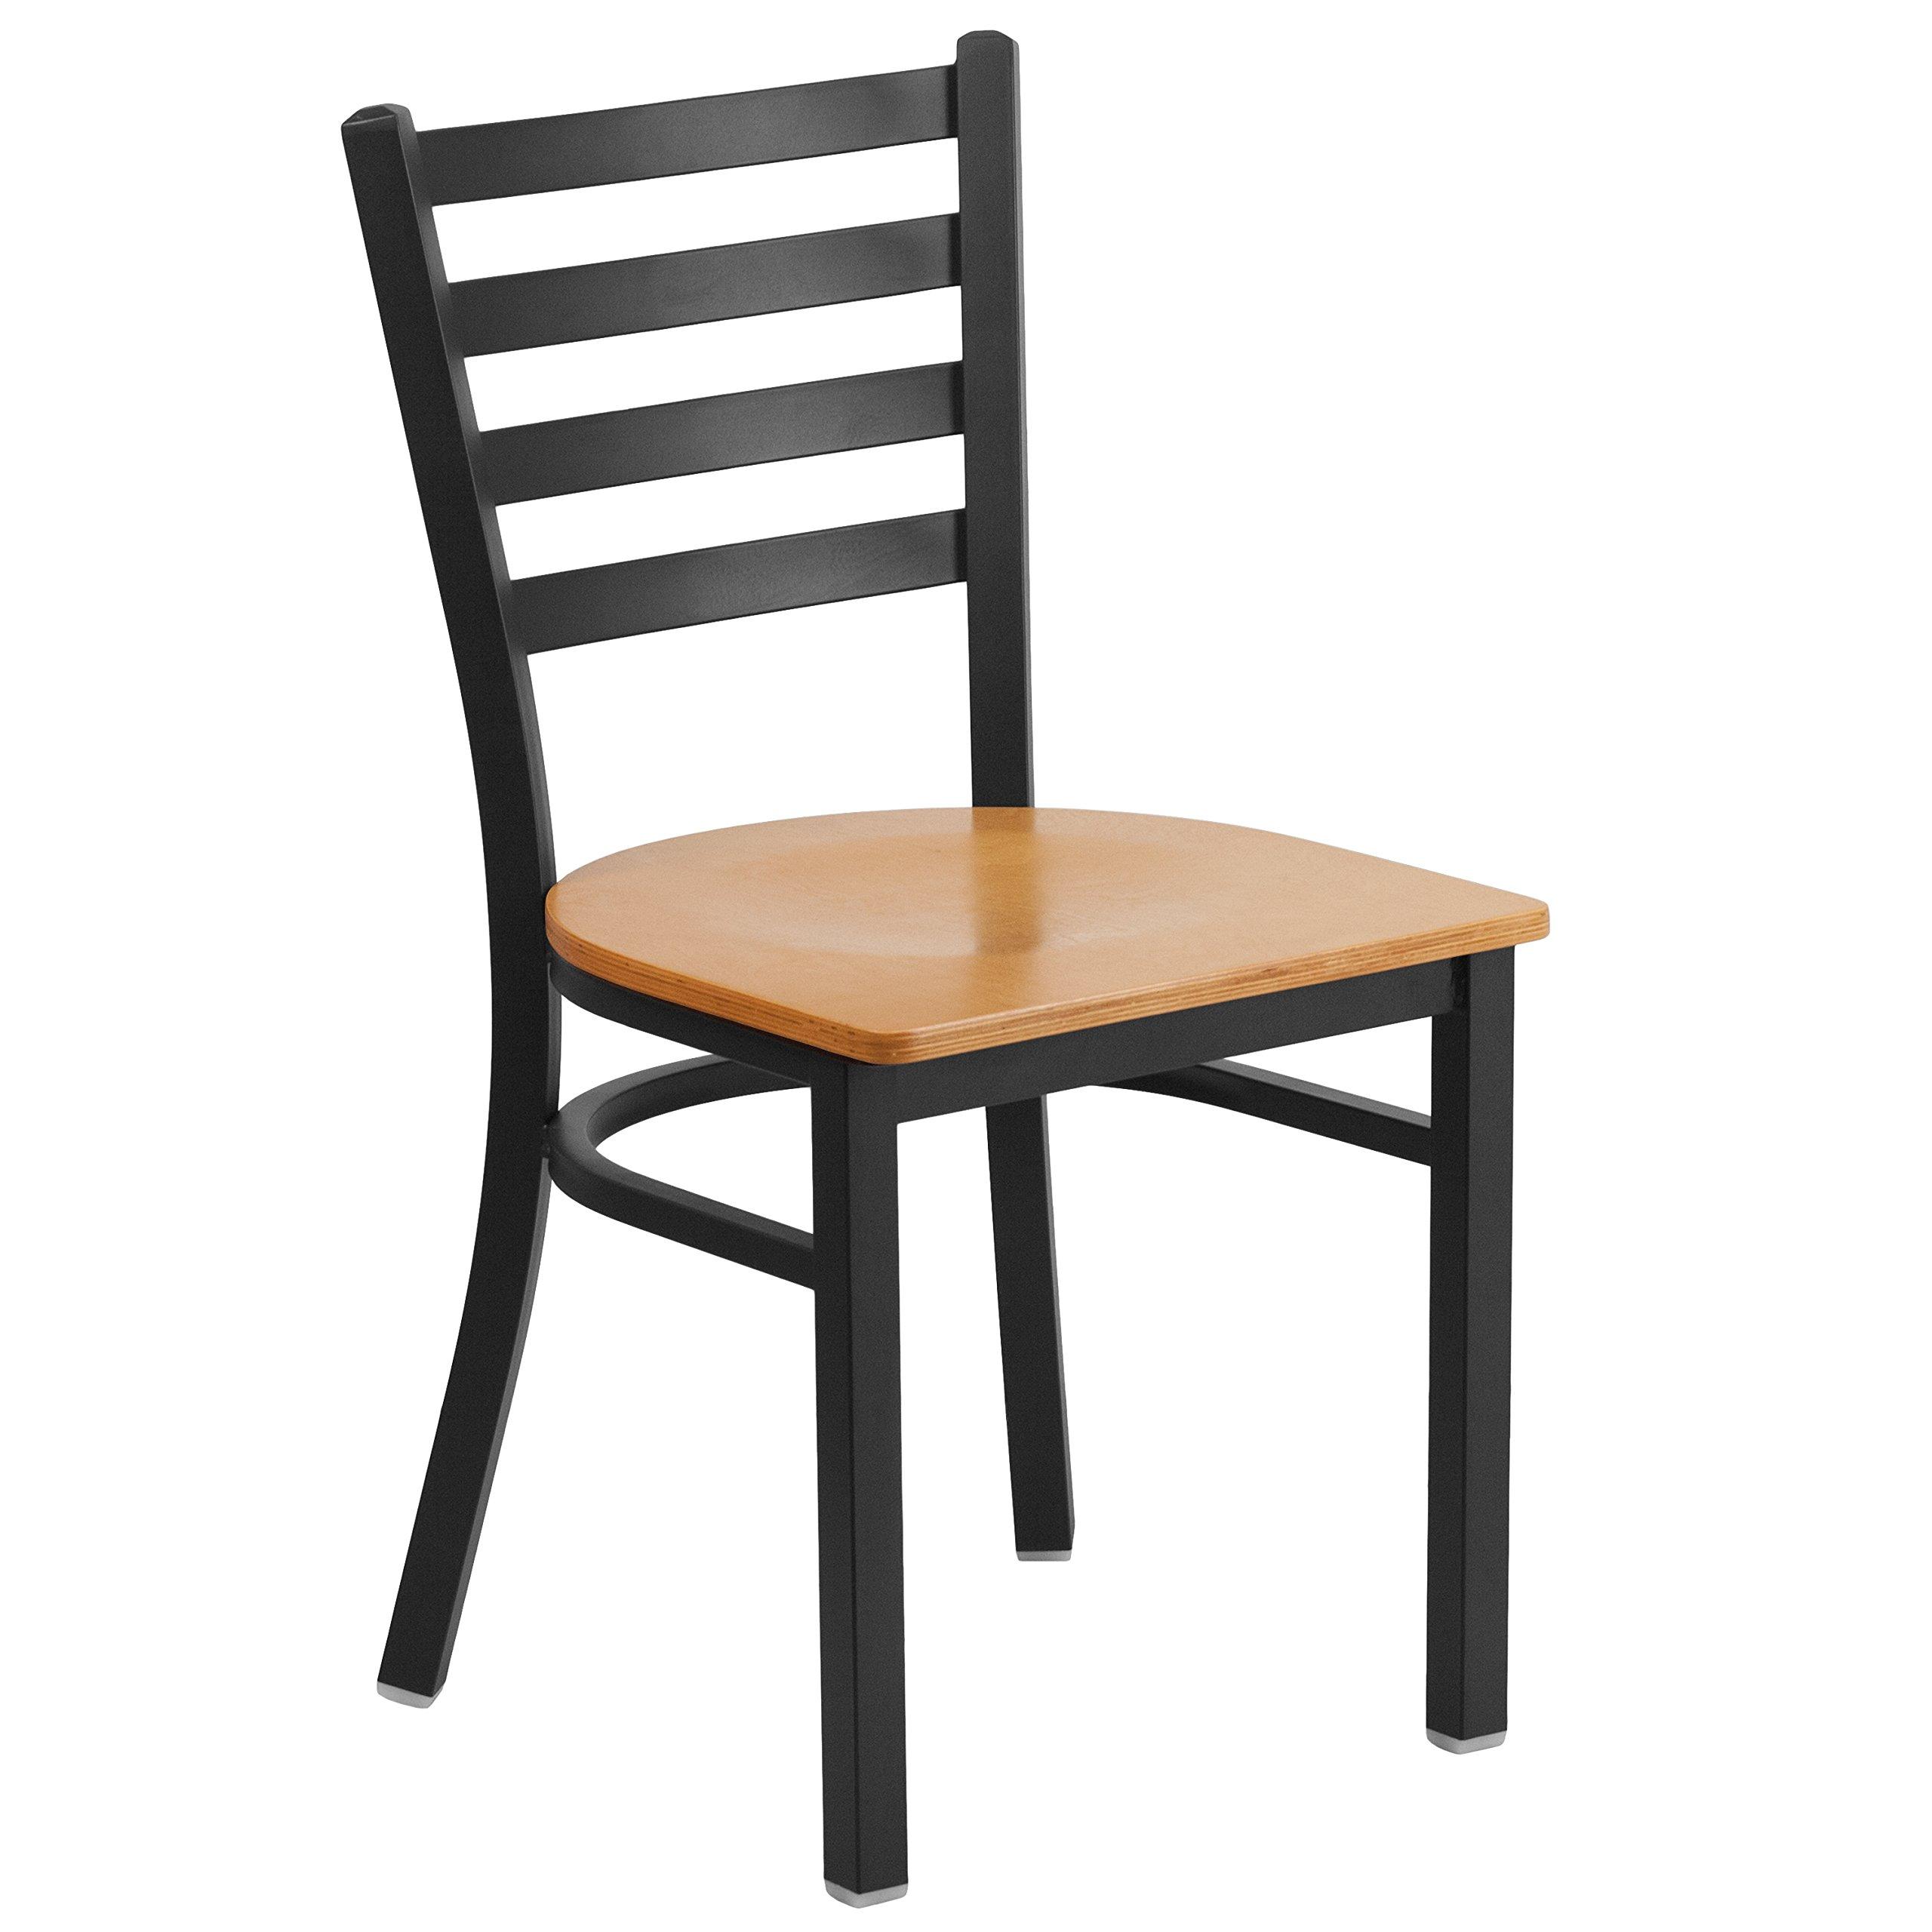 Flash Furniture HERCULES Series Black Ladder Back Metal Restaurant Chair - Natural Wood Seat by Flash Furniture (Image #1)